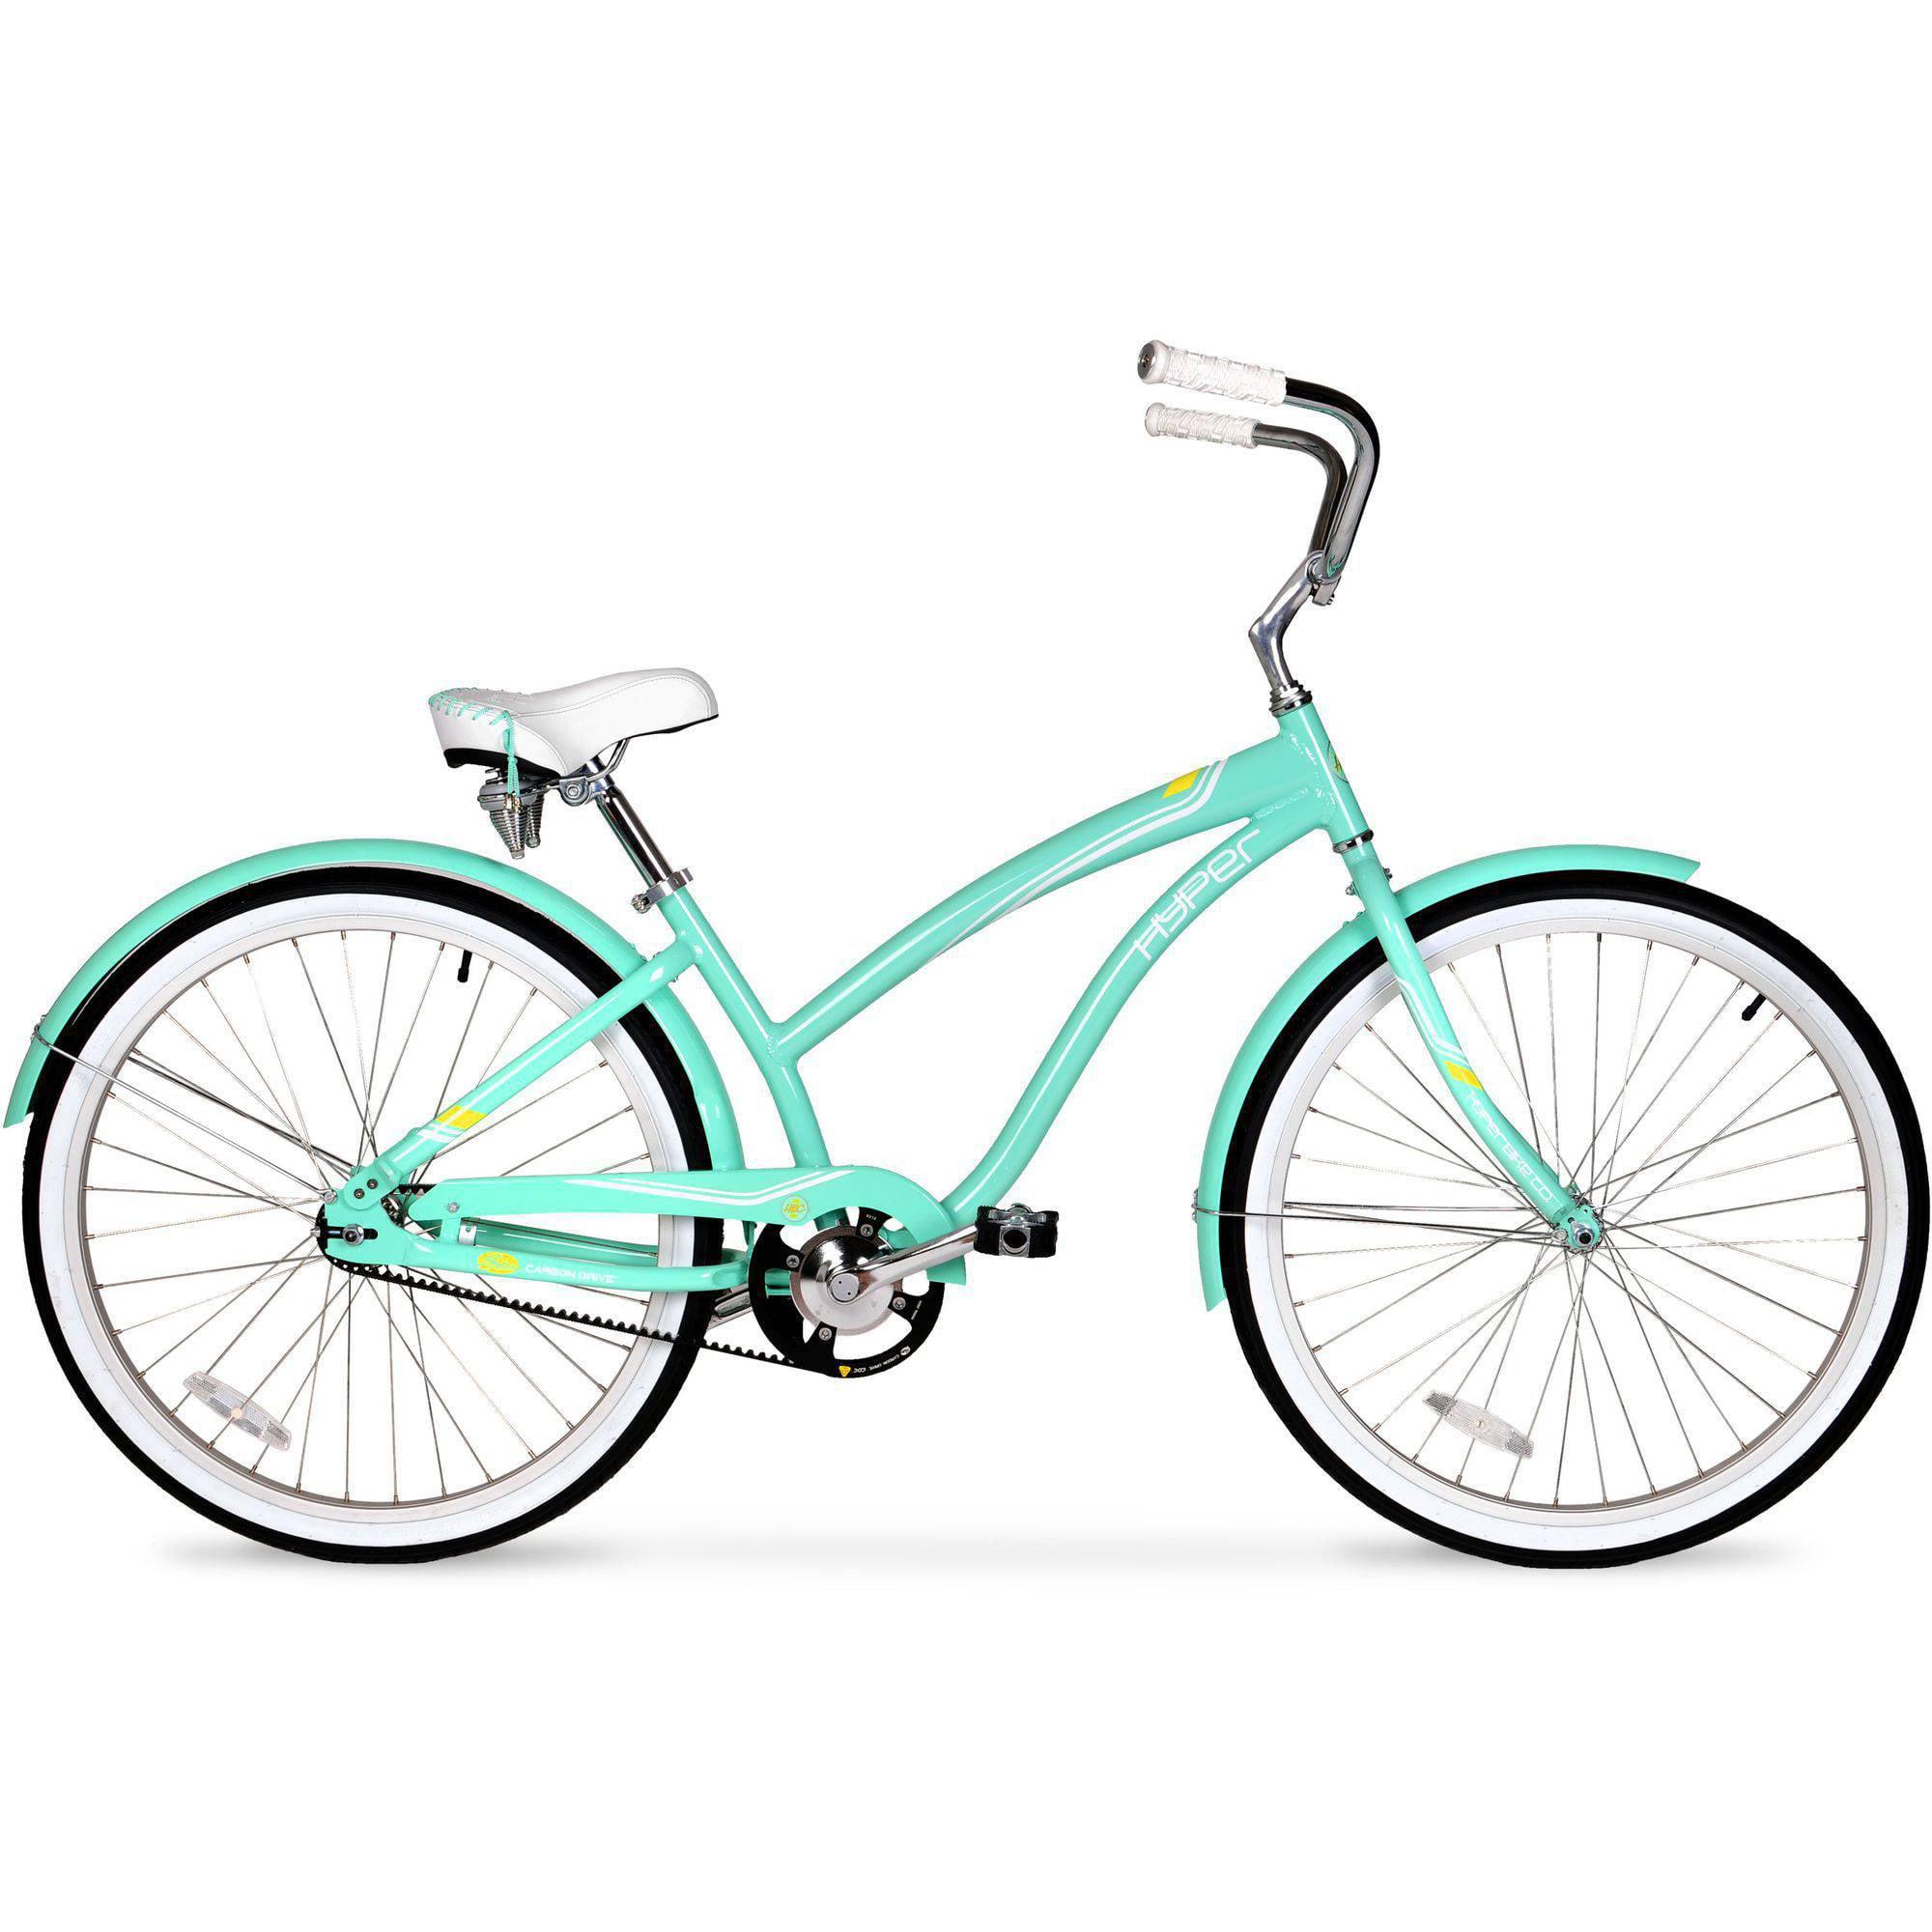 "26"" Women's Hyper HBC Belt Drive Bike, Seafoam Green"